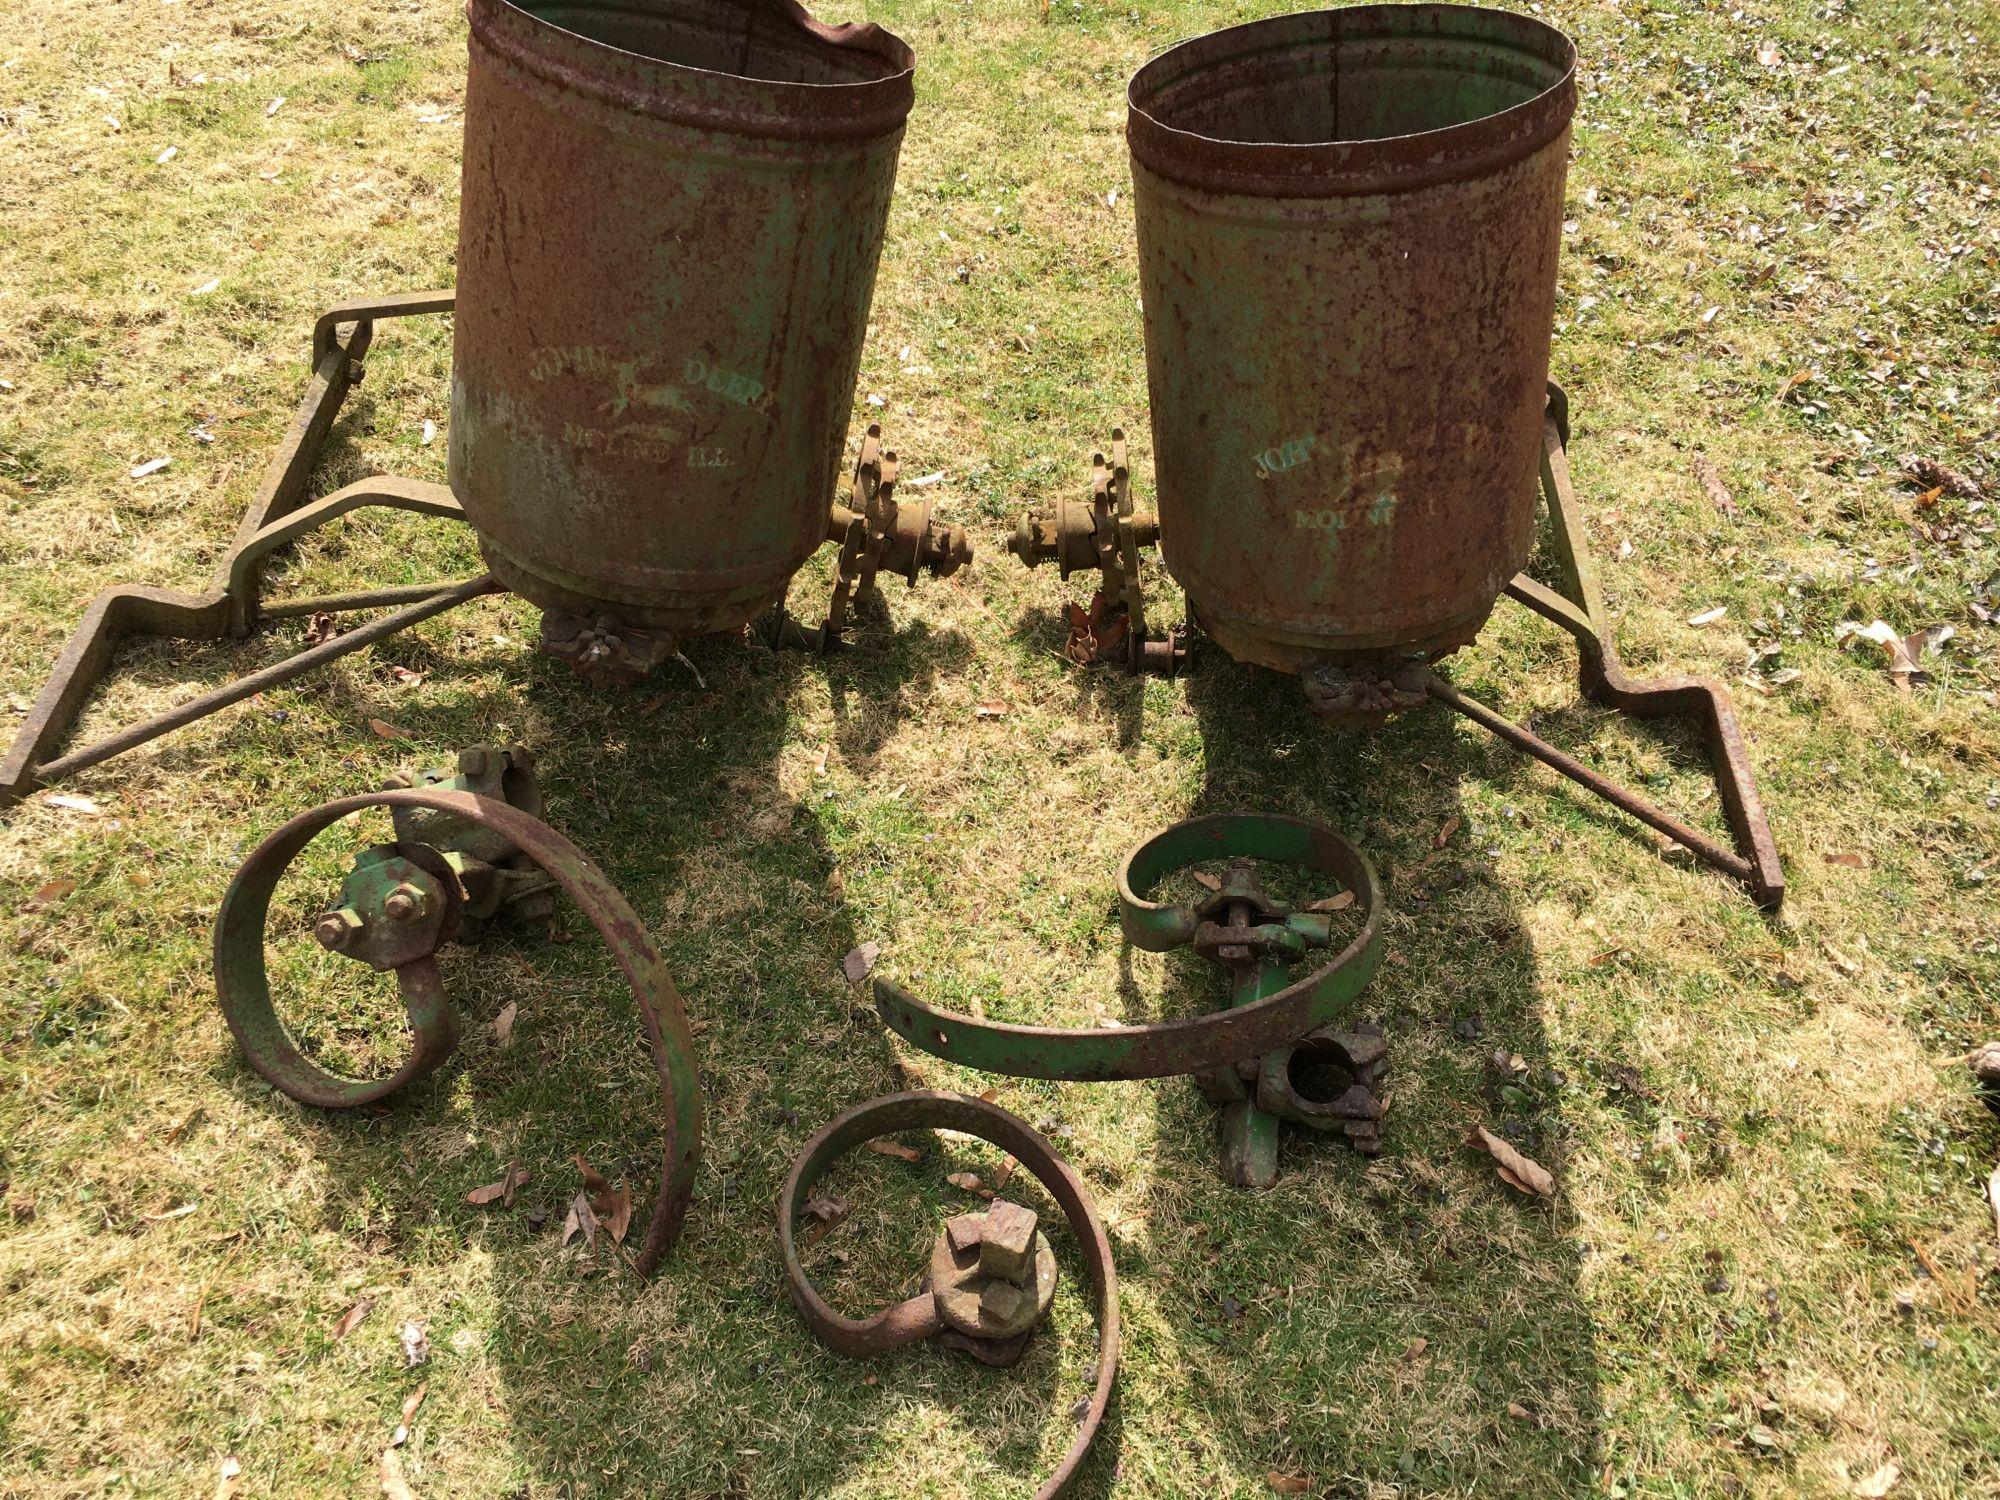 Antique Seed Planter Www Topsimages Com